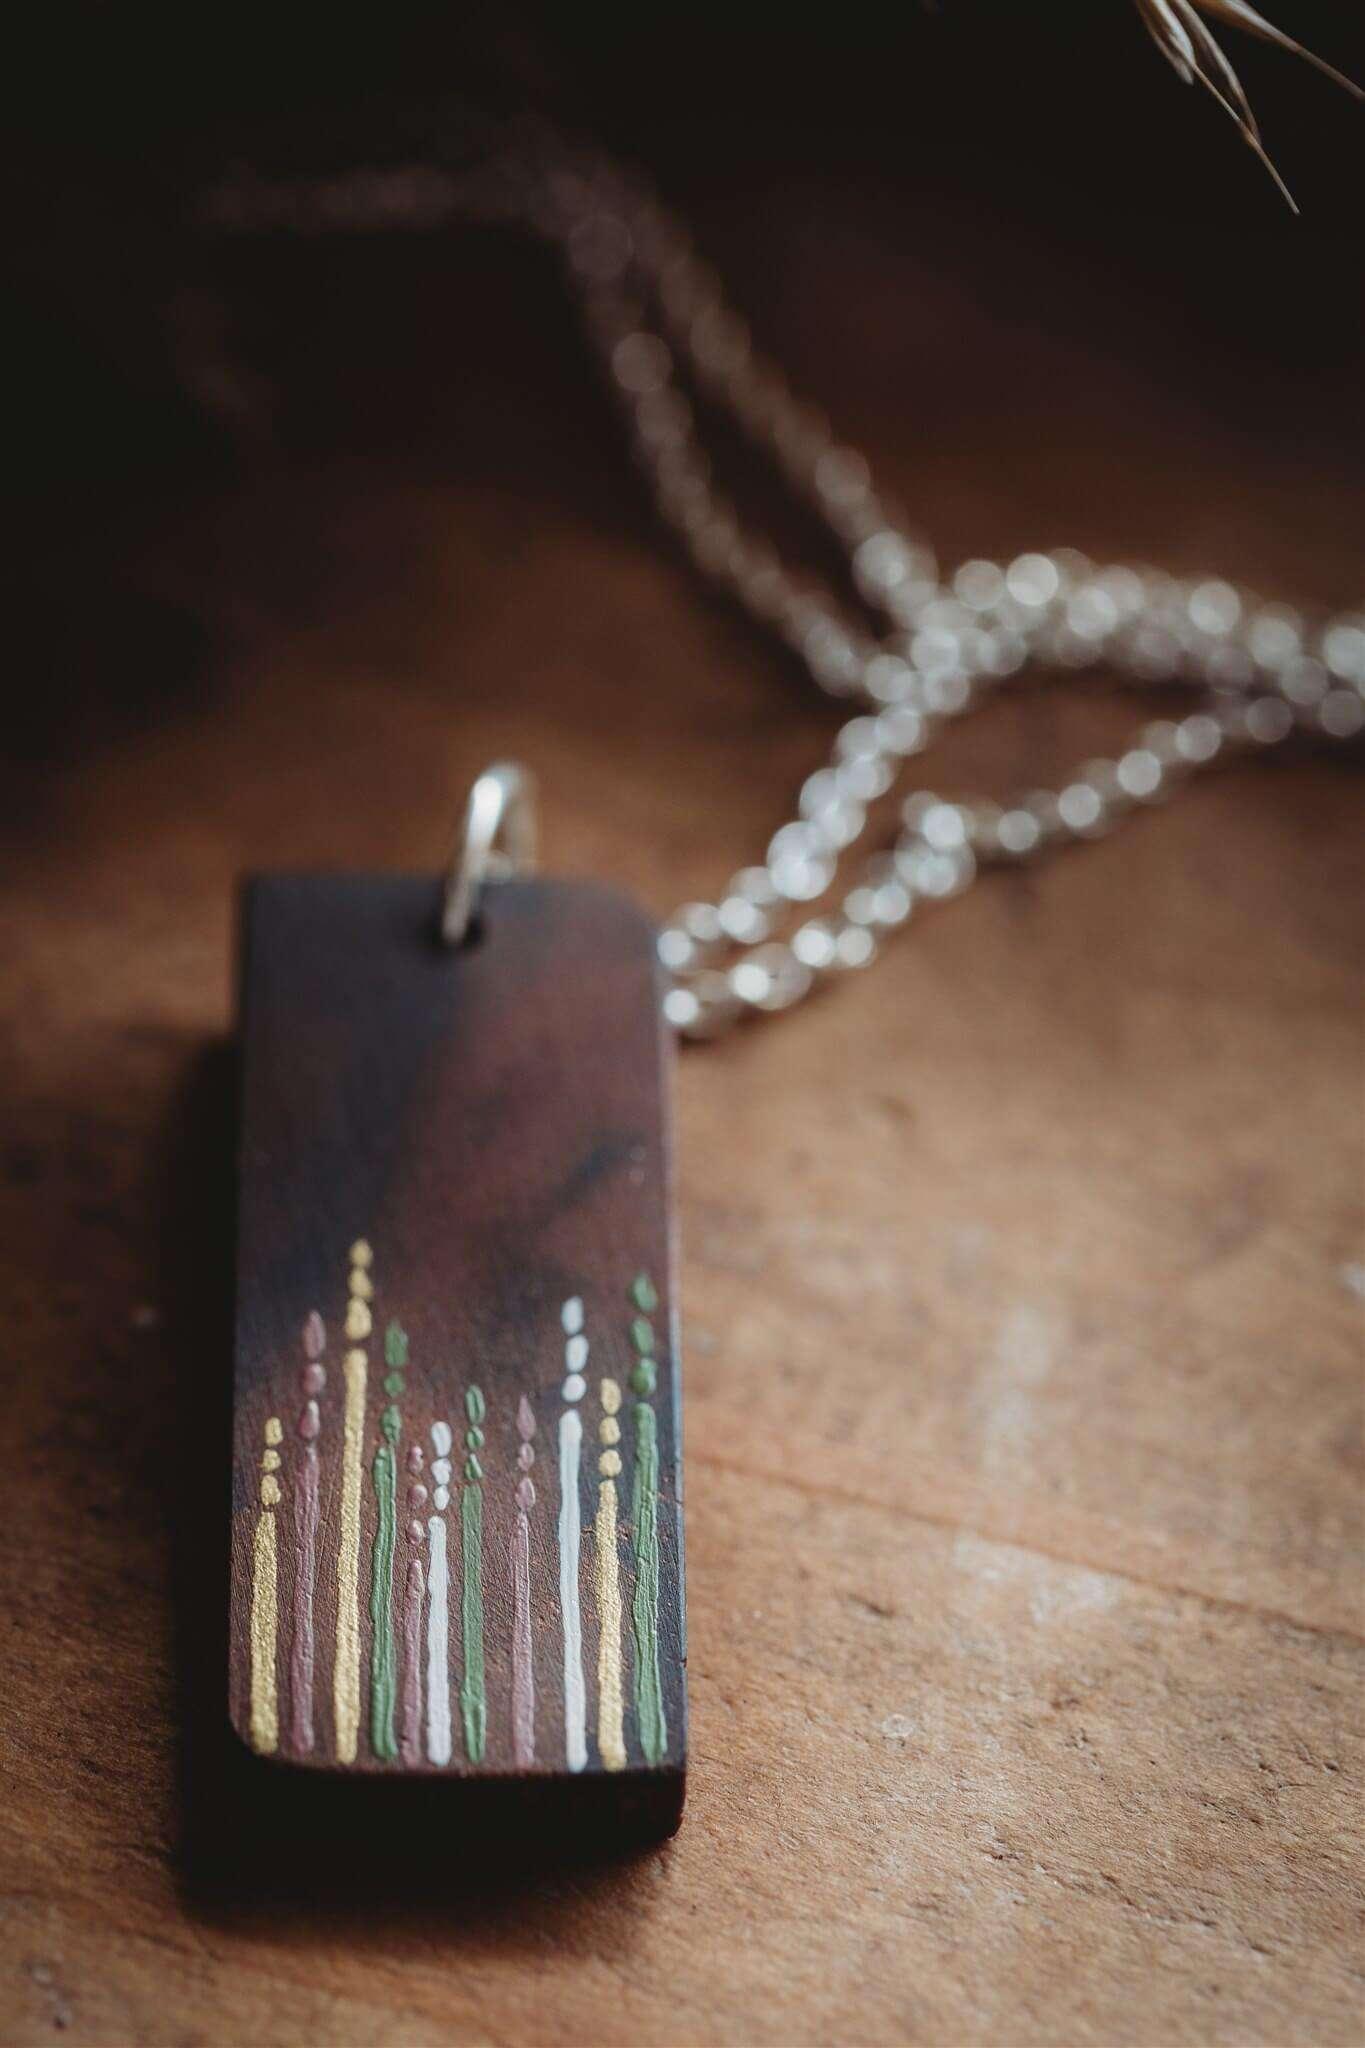 Bianca Rosewood Meadow Grass Design Wooden Pendant Necklace